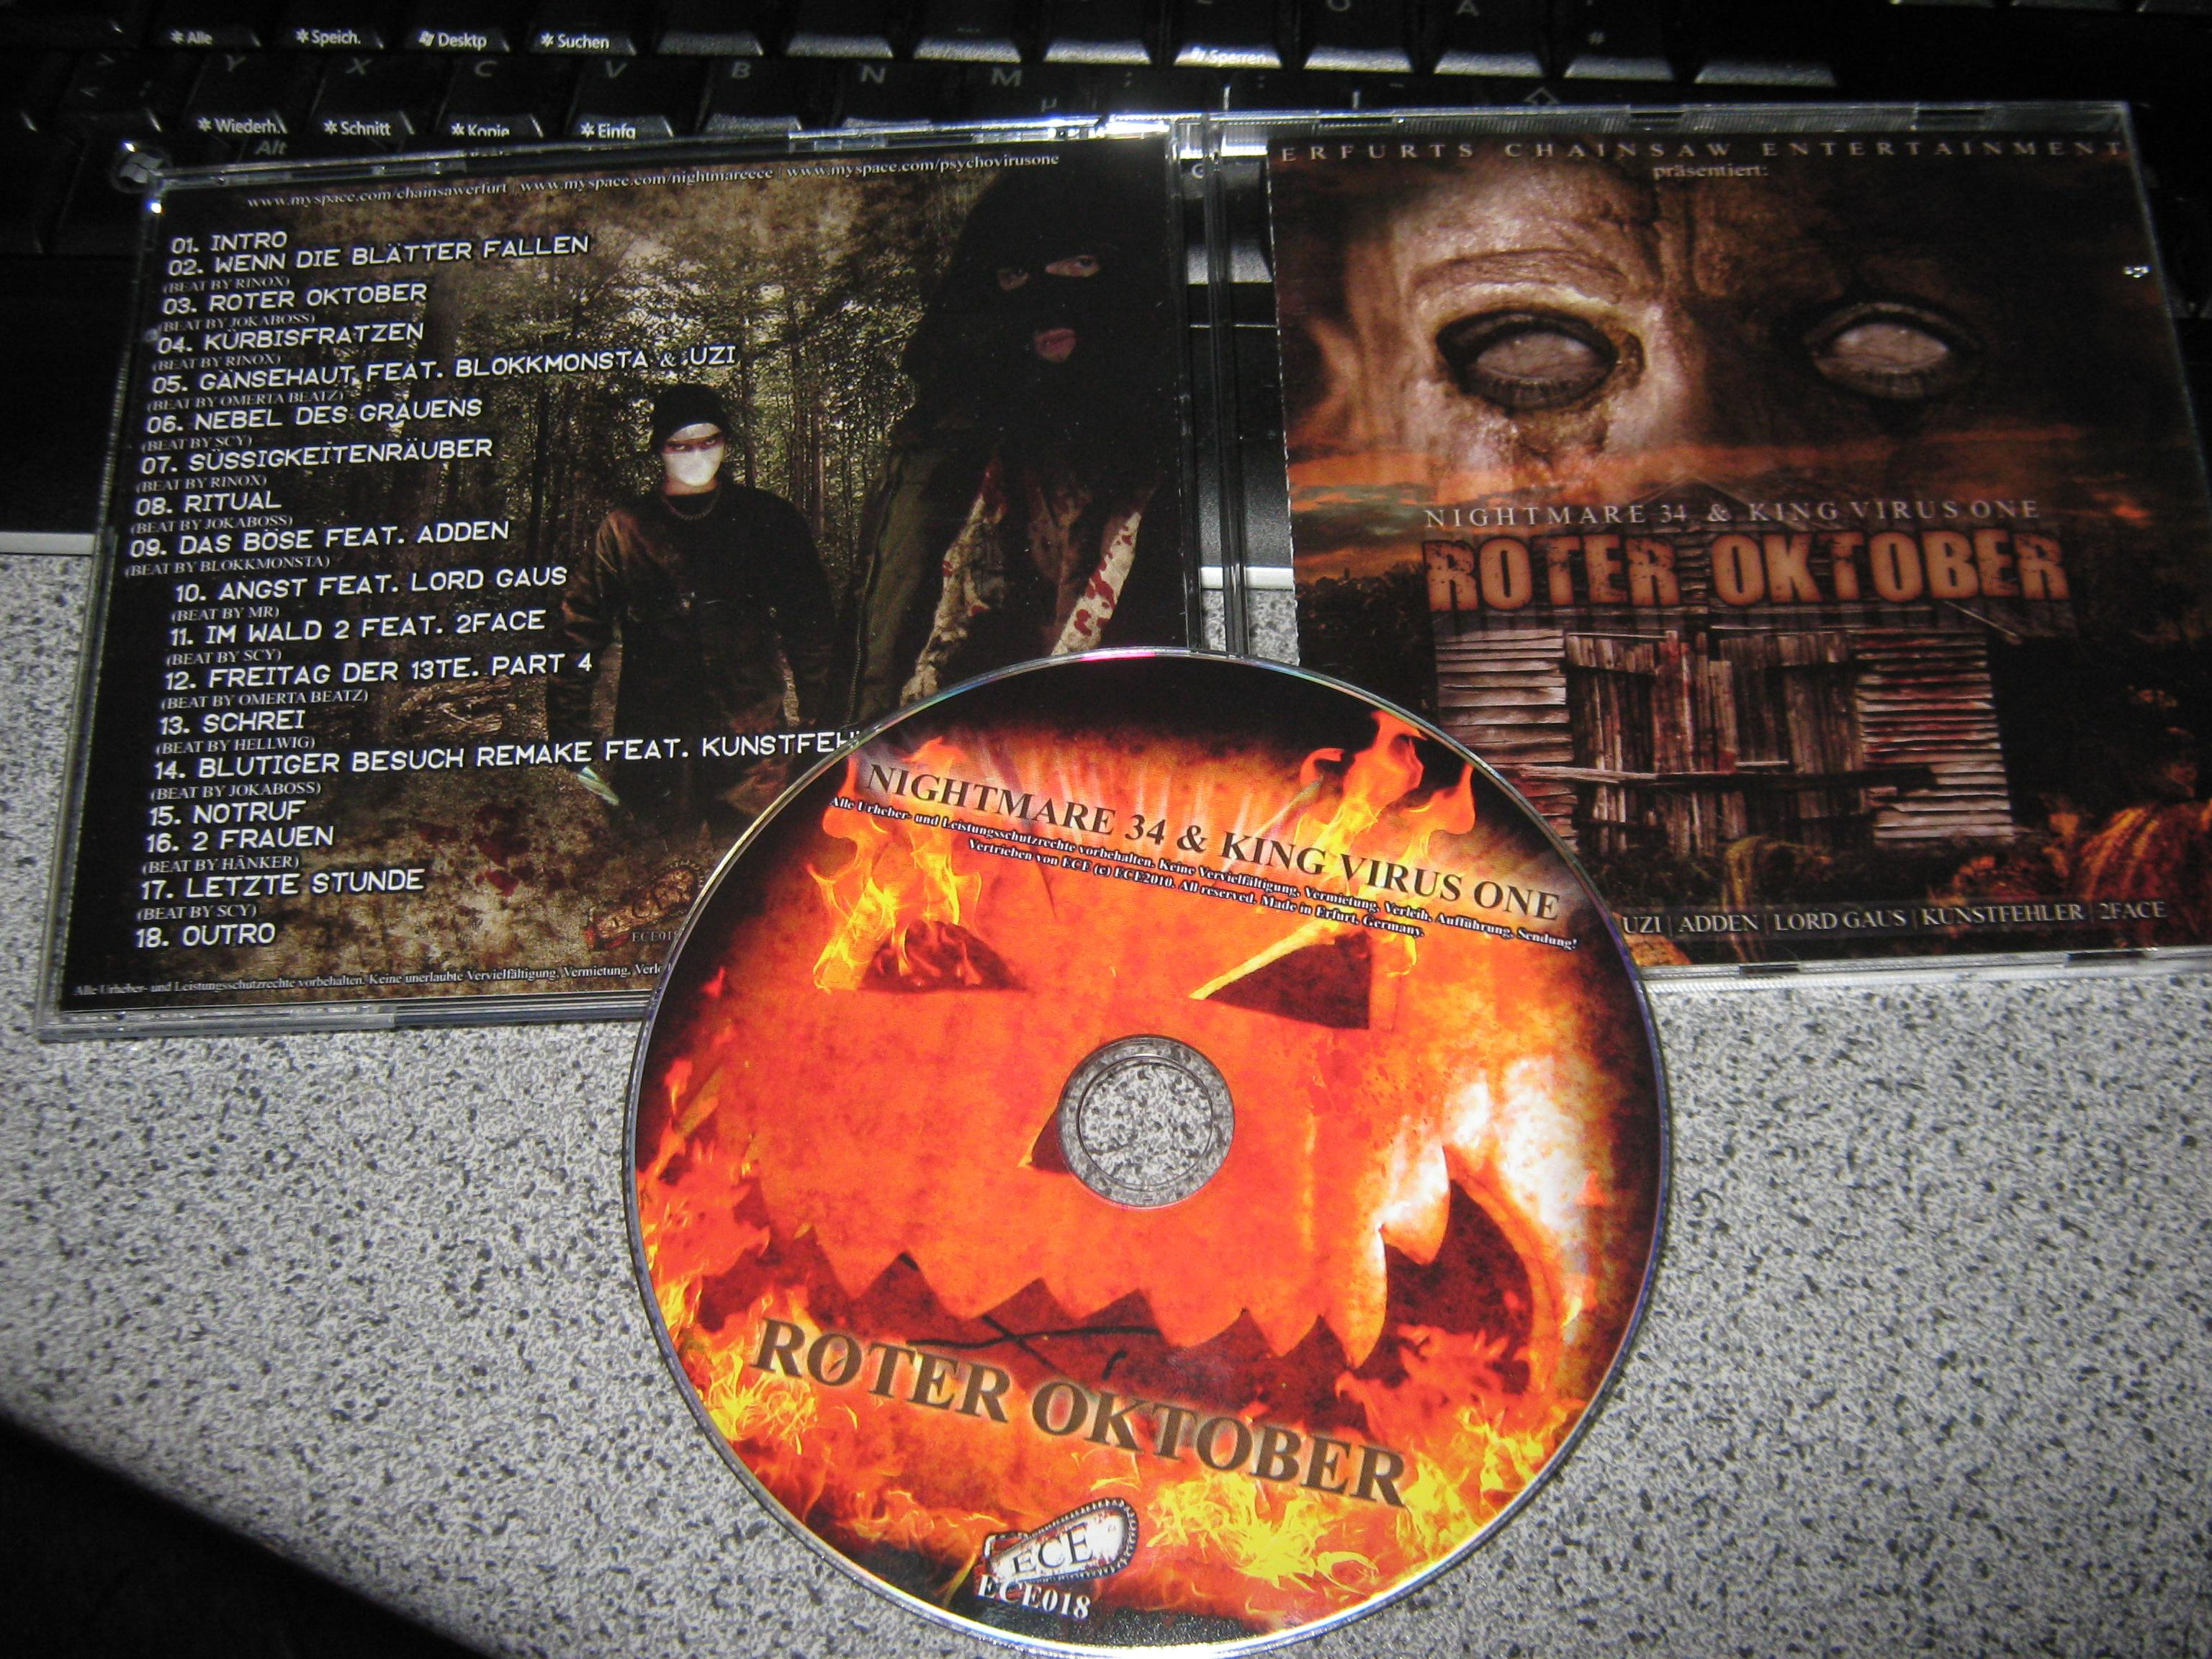 Nightmare 34 and King Virus One-Roter Oktober-DE-2010